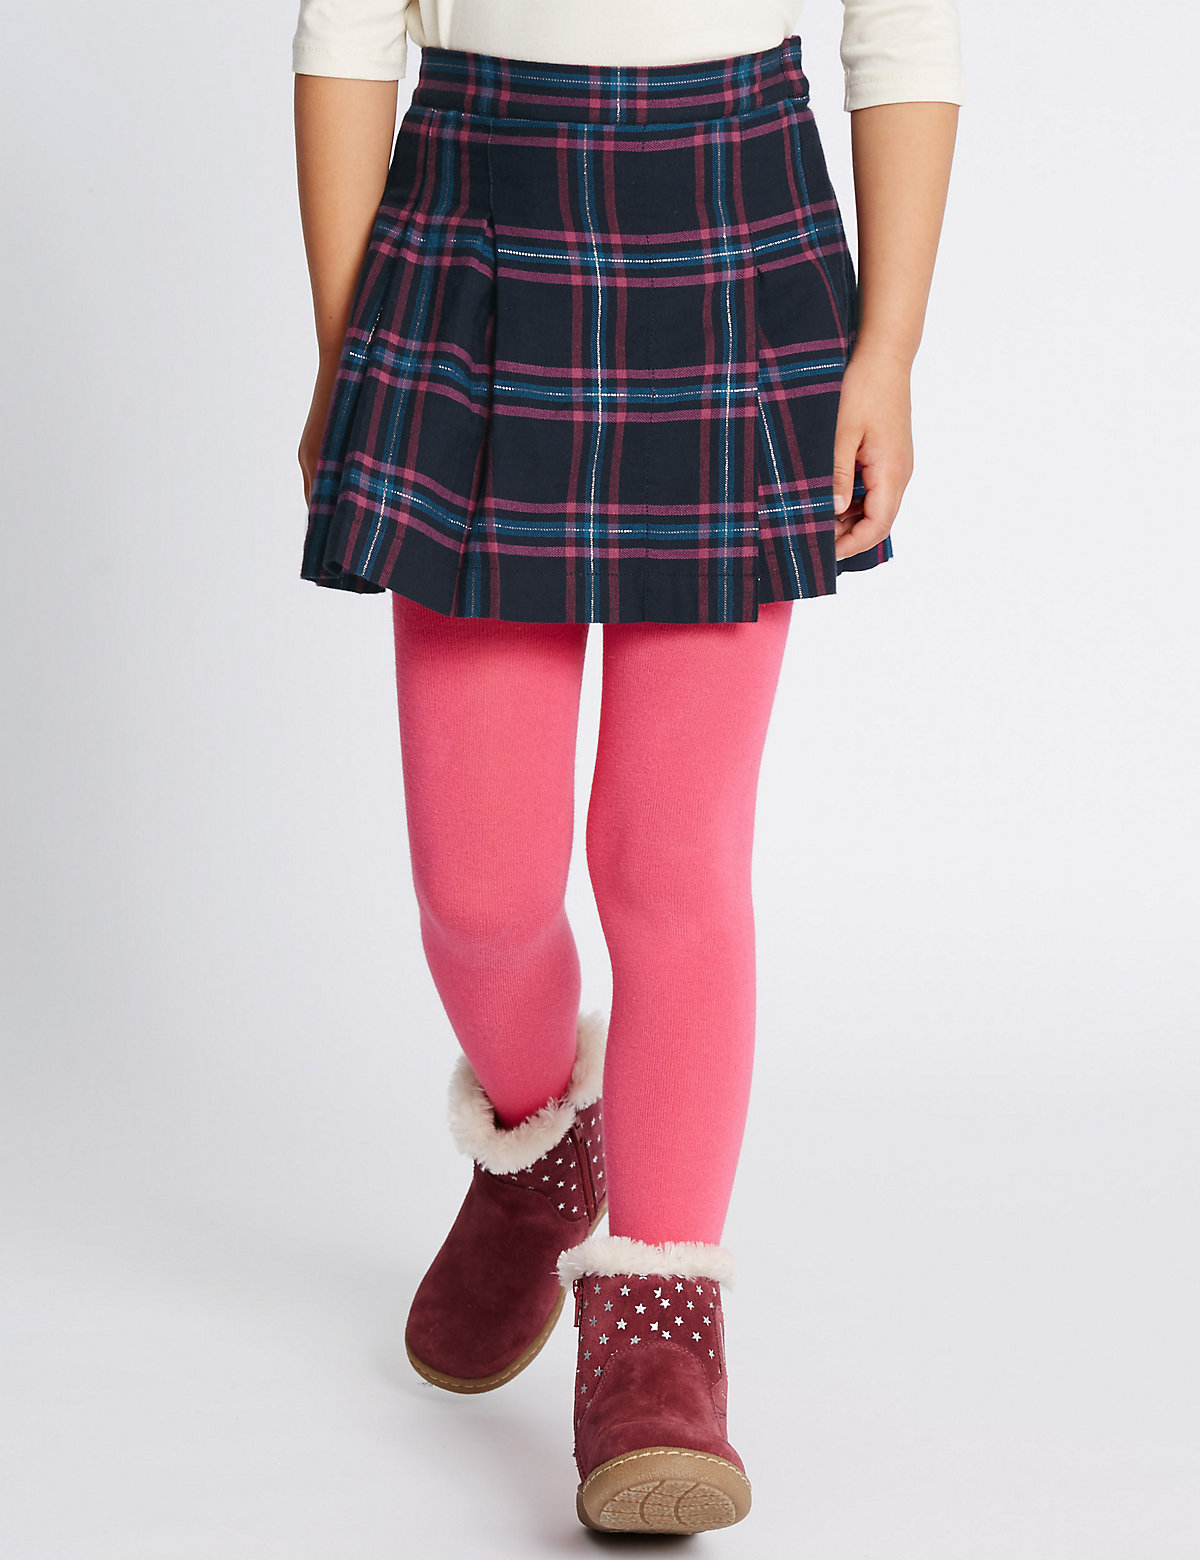 Checked Kilt ALine Skirt (17 Years)